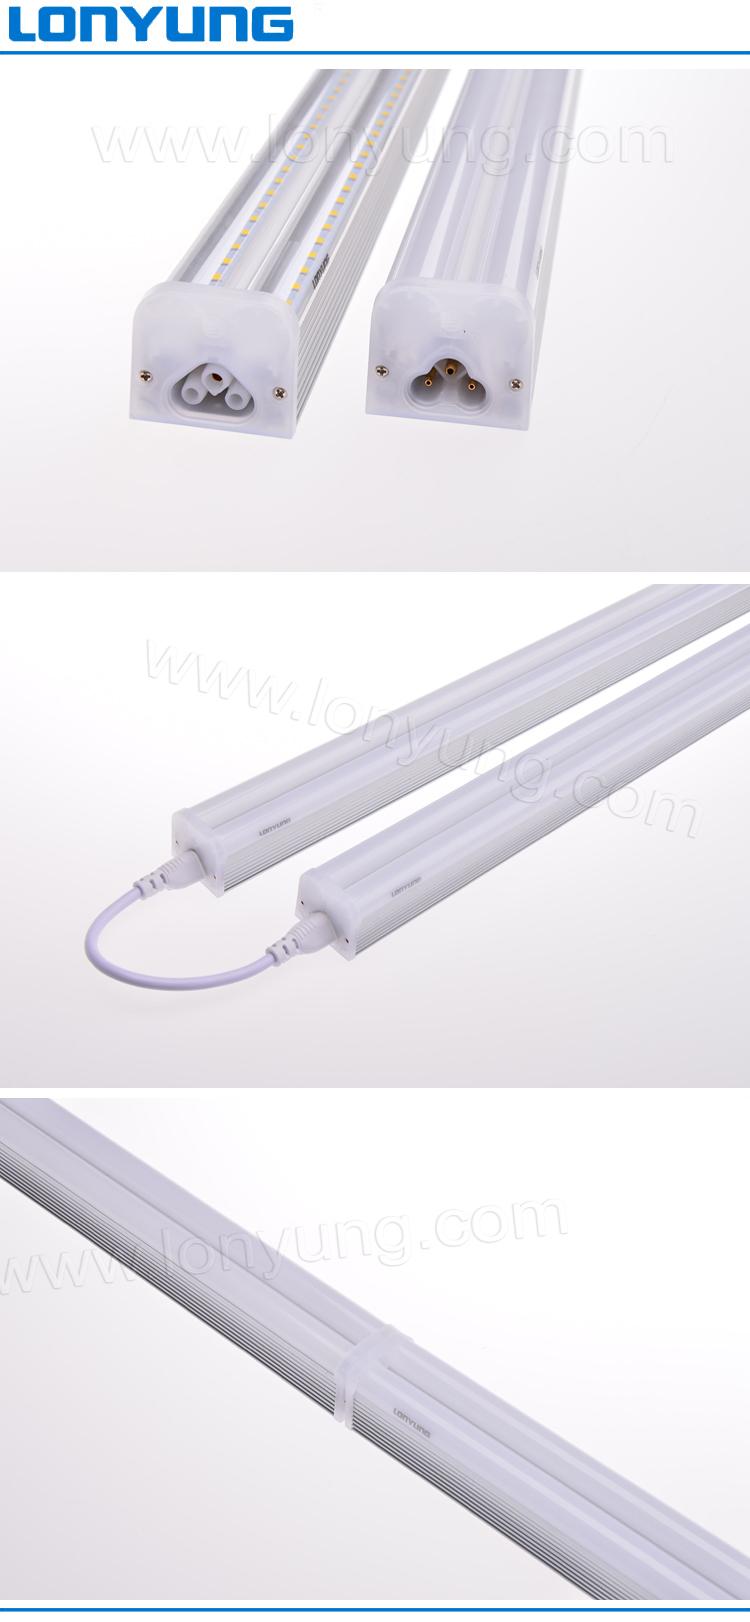 Ul 4ft Twin T5 Led Tube Light Fixture 12m 30w Wiring Diagram 3